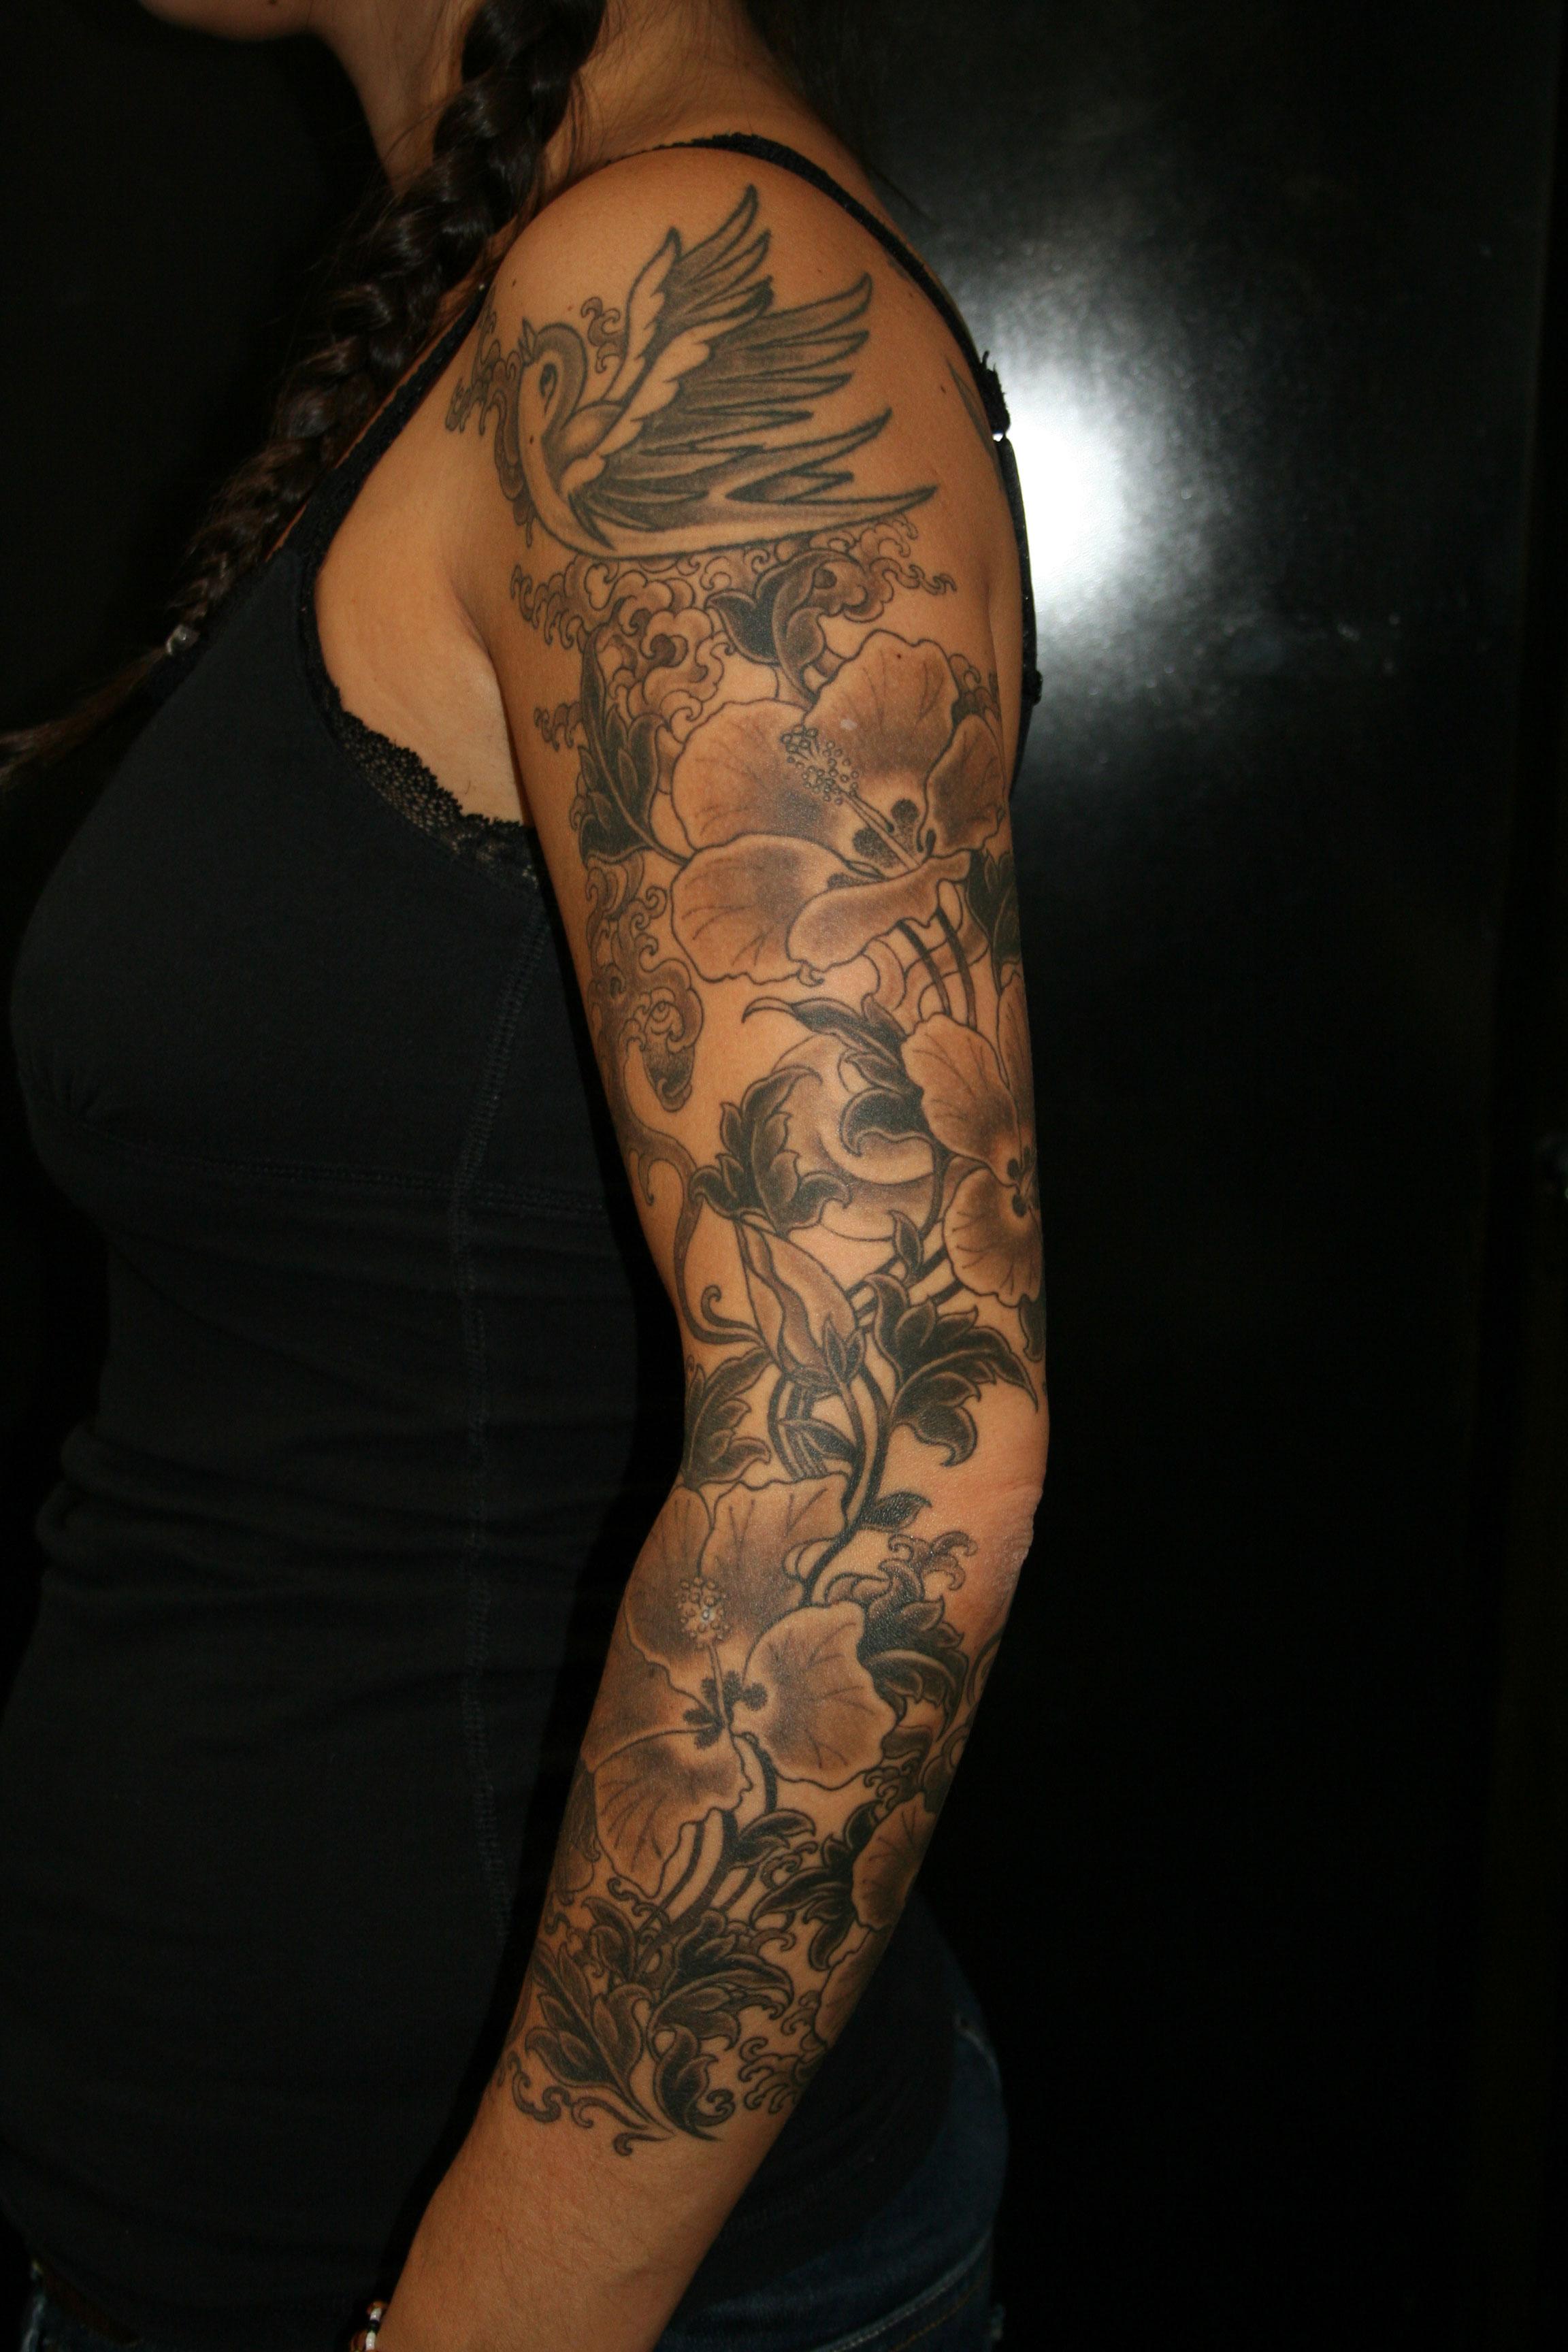 Floral Full Sleeve Tattoo Cool Tattoos Bonbaden